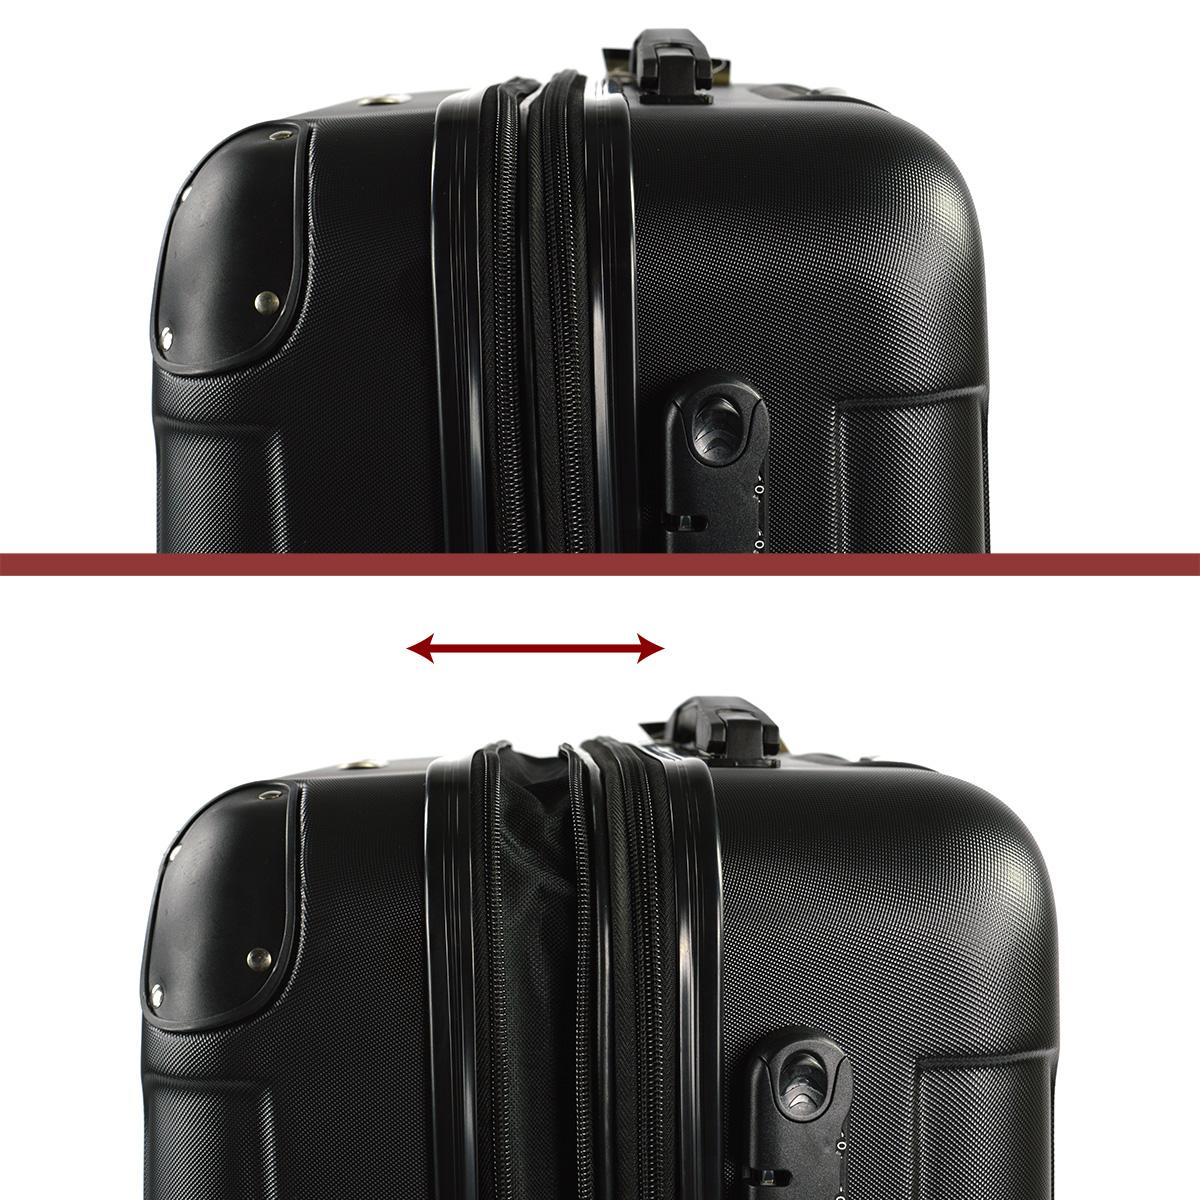 Koffer-Flexot-2045-Hartschalenkoffer-Trolley-Kofferset-Reisekoffer-M-L-XL-Set Indexbild 44